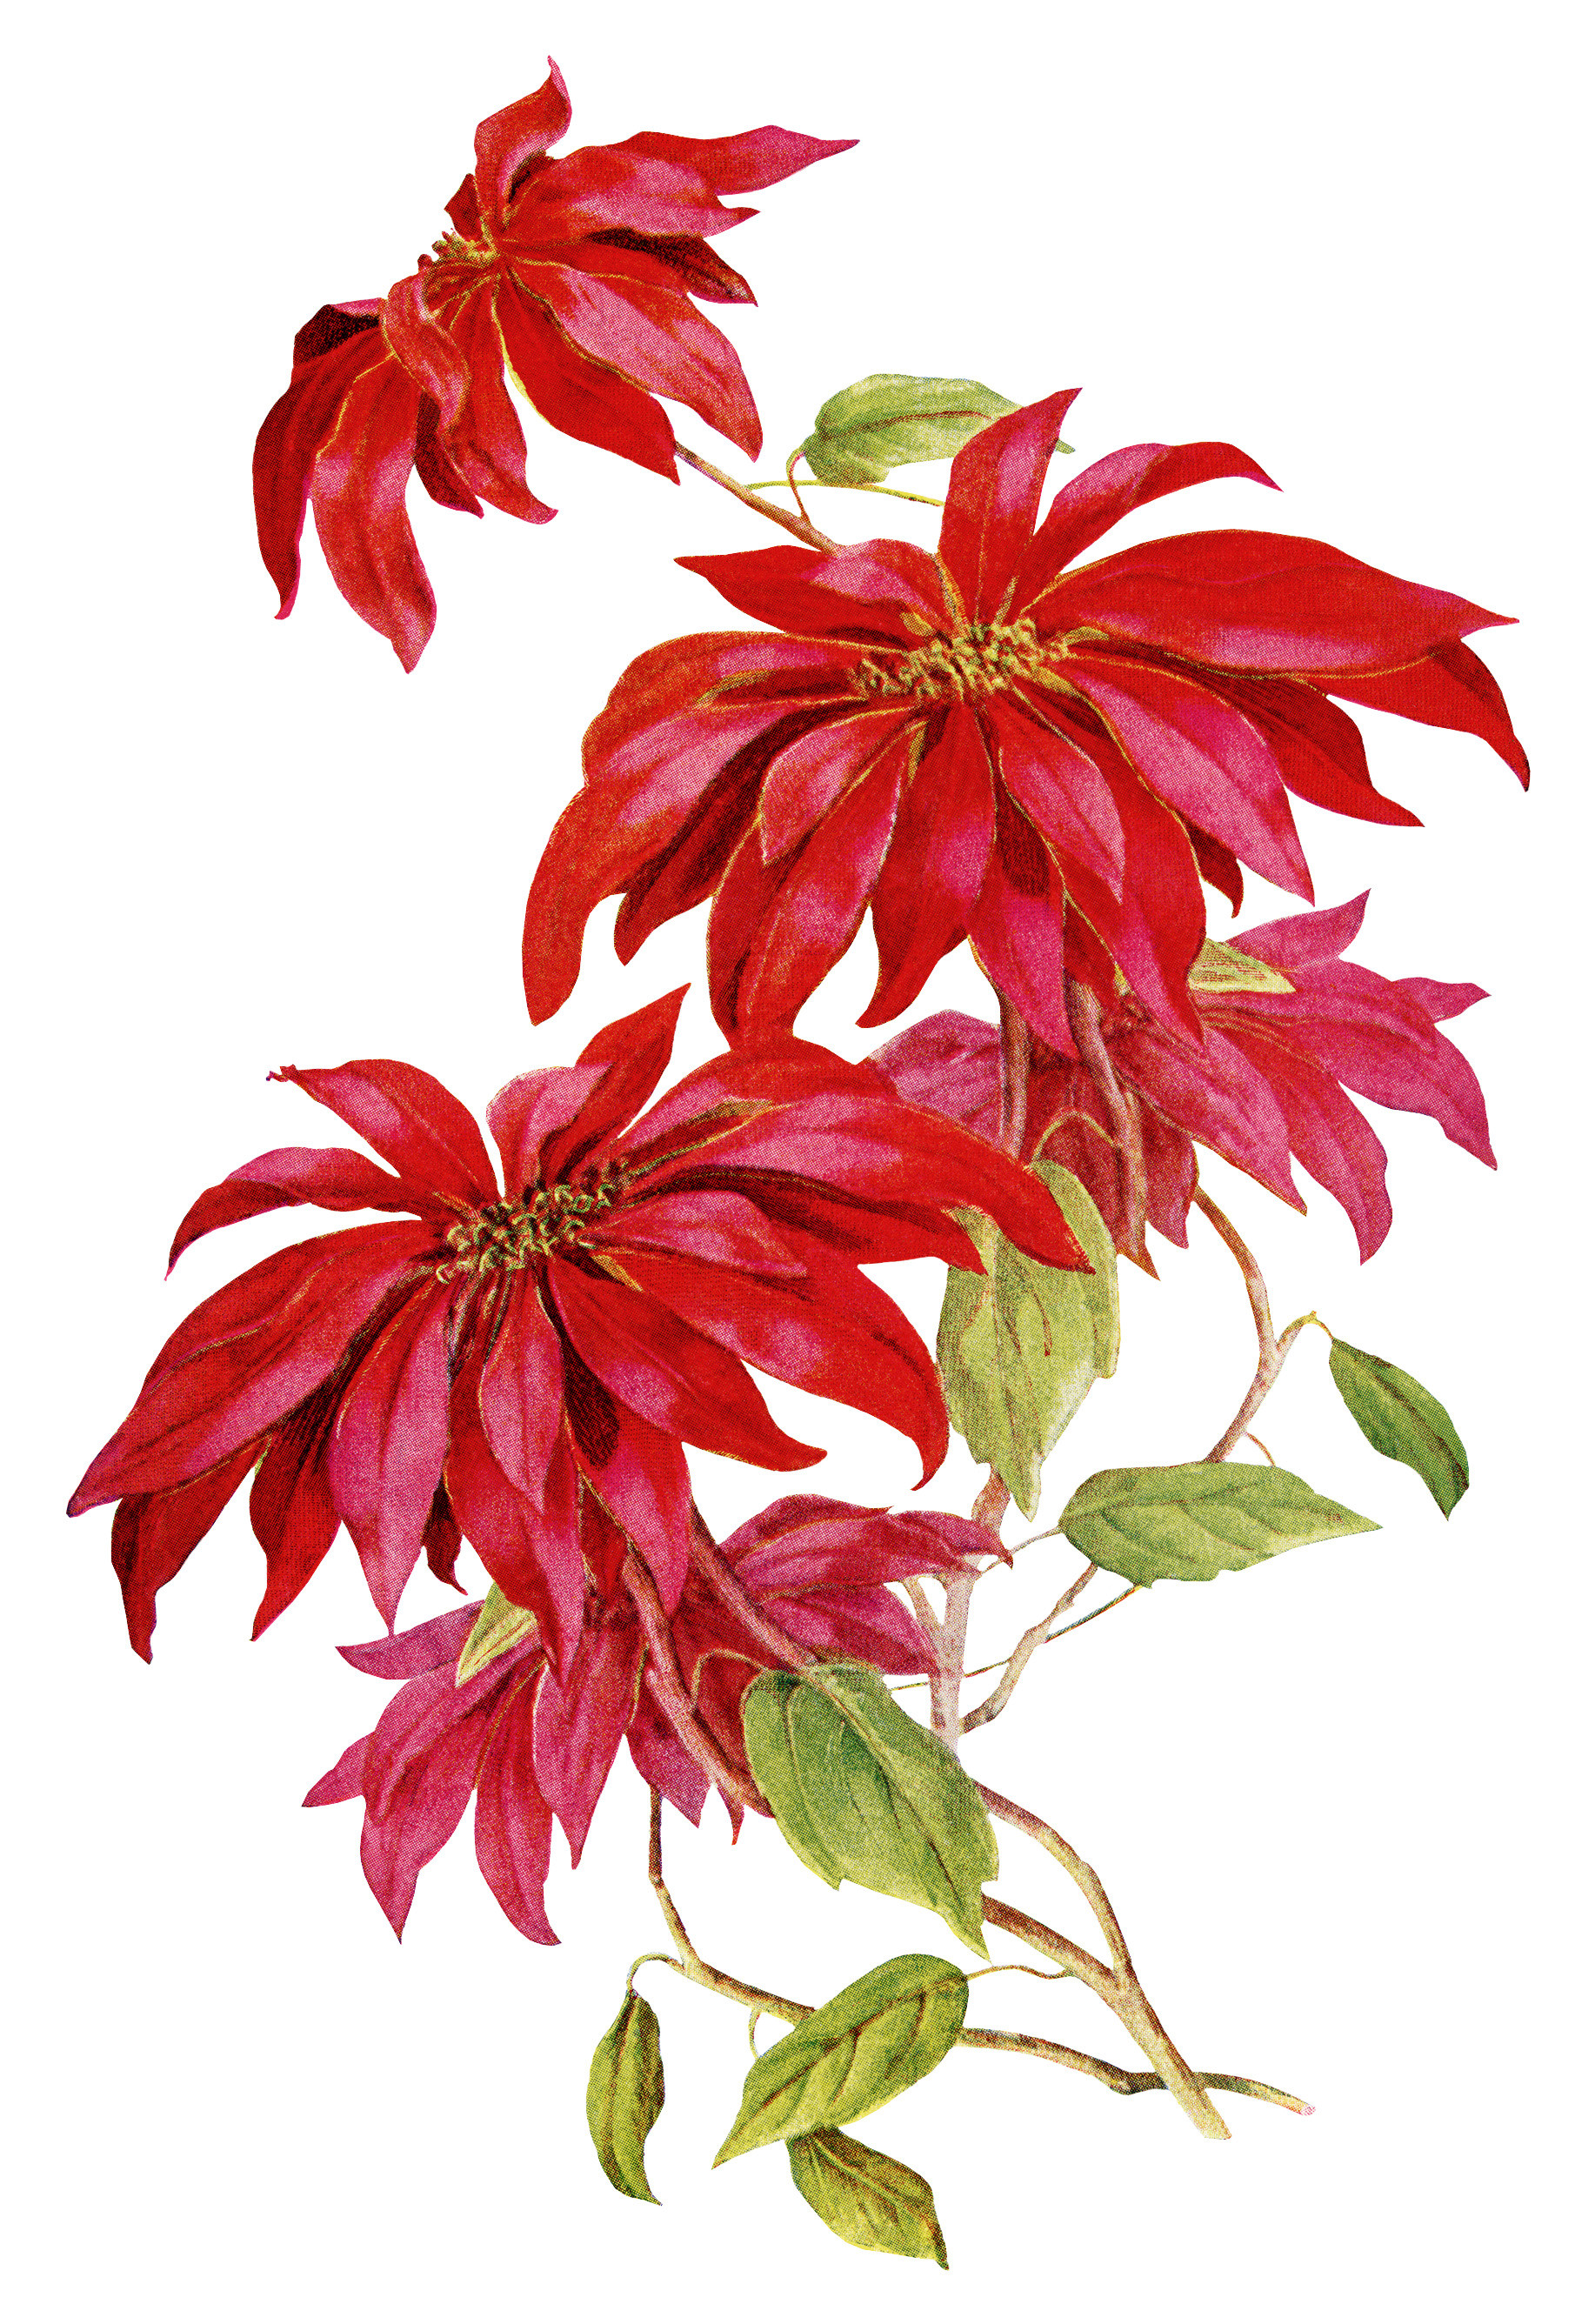 Christmas Flower Images  Poinsettia Christmas Flower Free Vintage Image